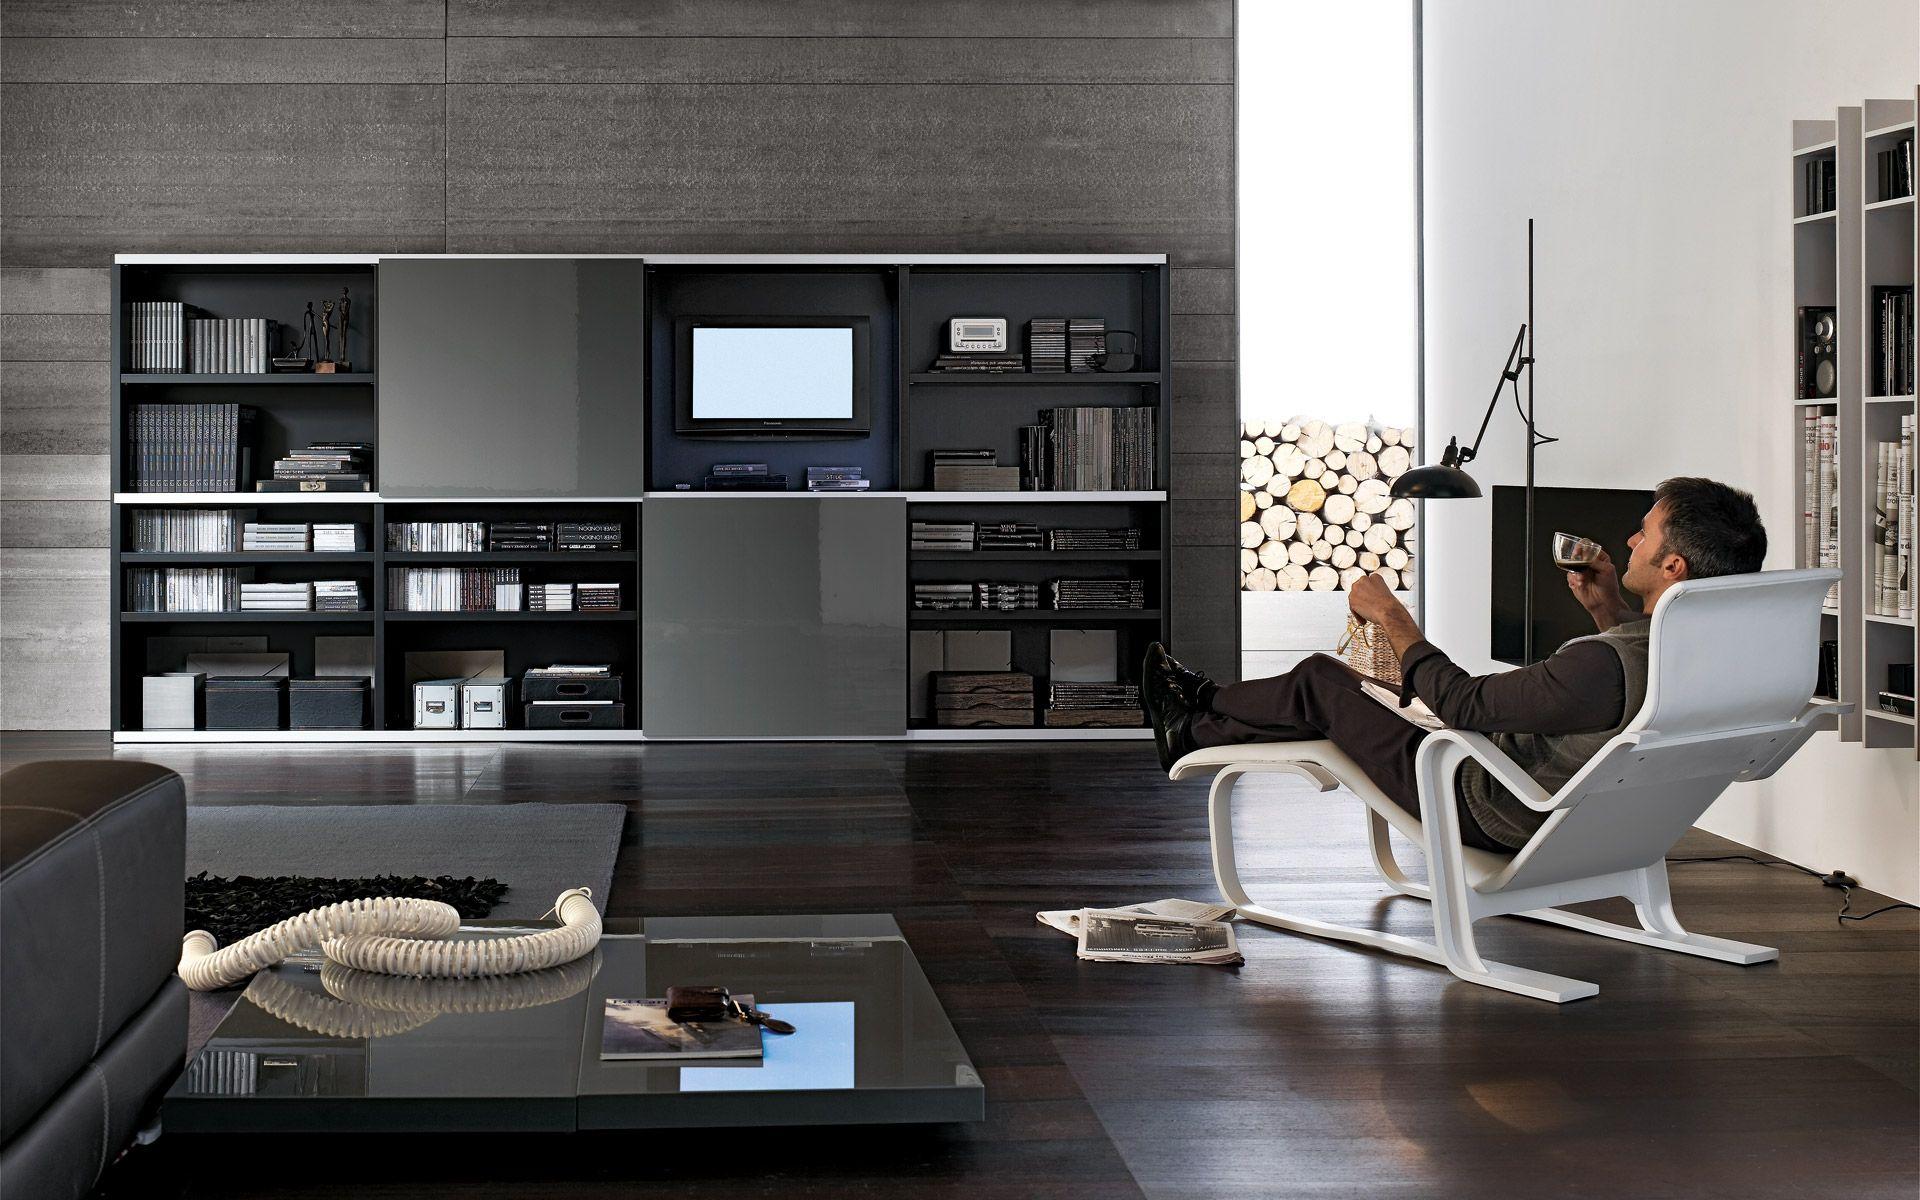 Arredamento Di Design arredamento di design made in italy - santa lucia | home